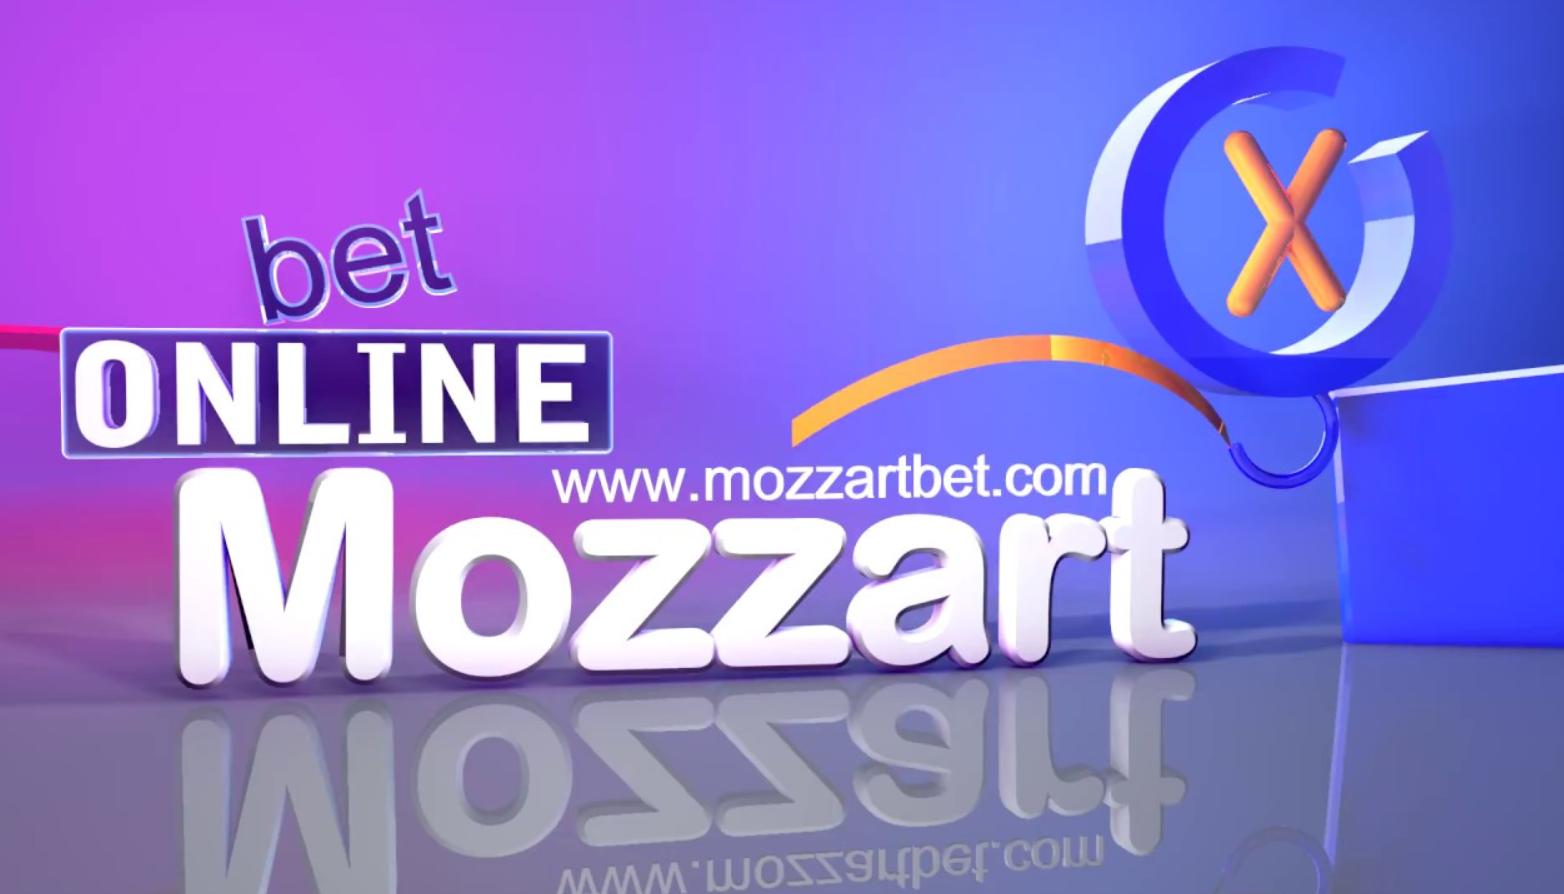 Mozzart bet platform in Kenya